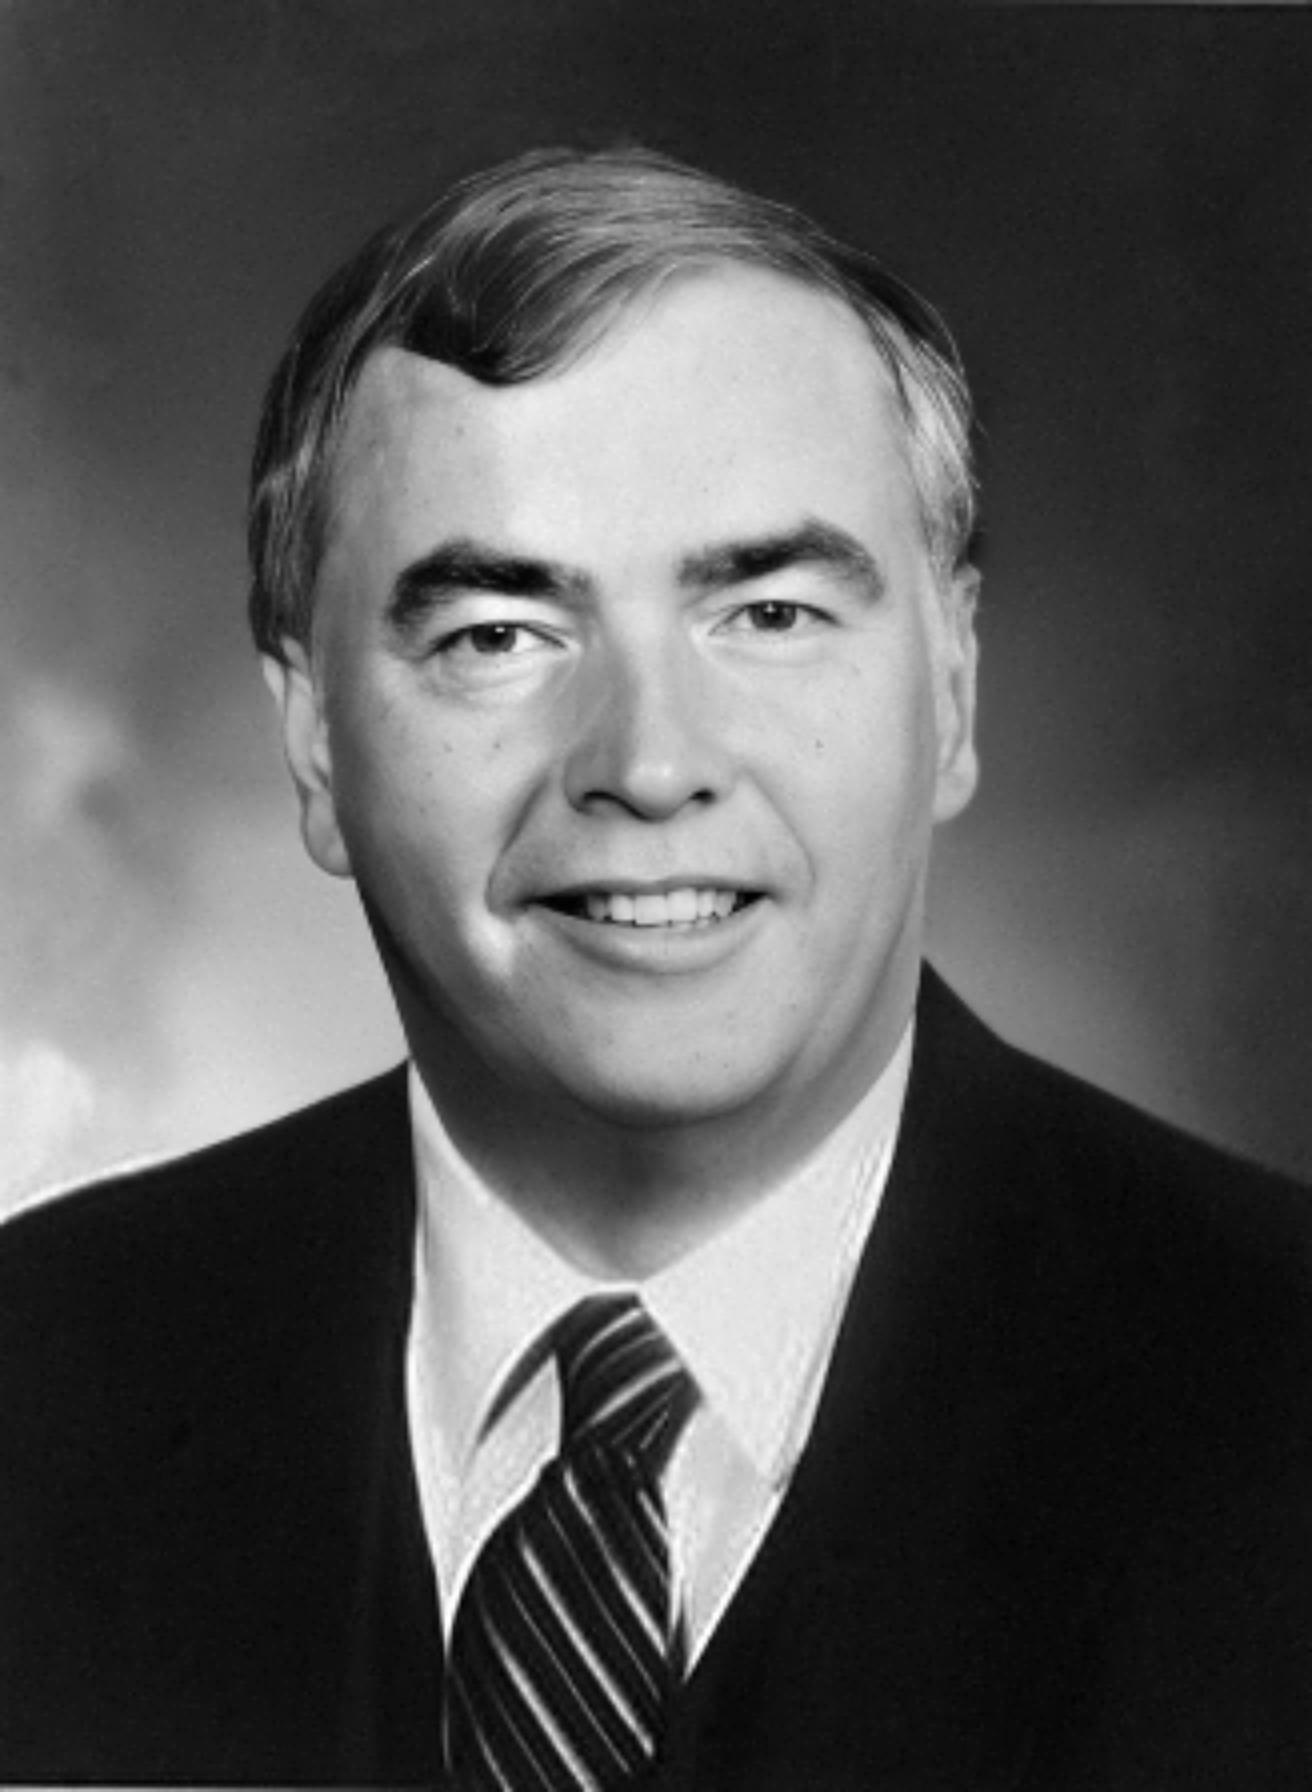 1980 United States Senate election in Alaska